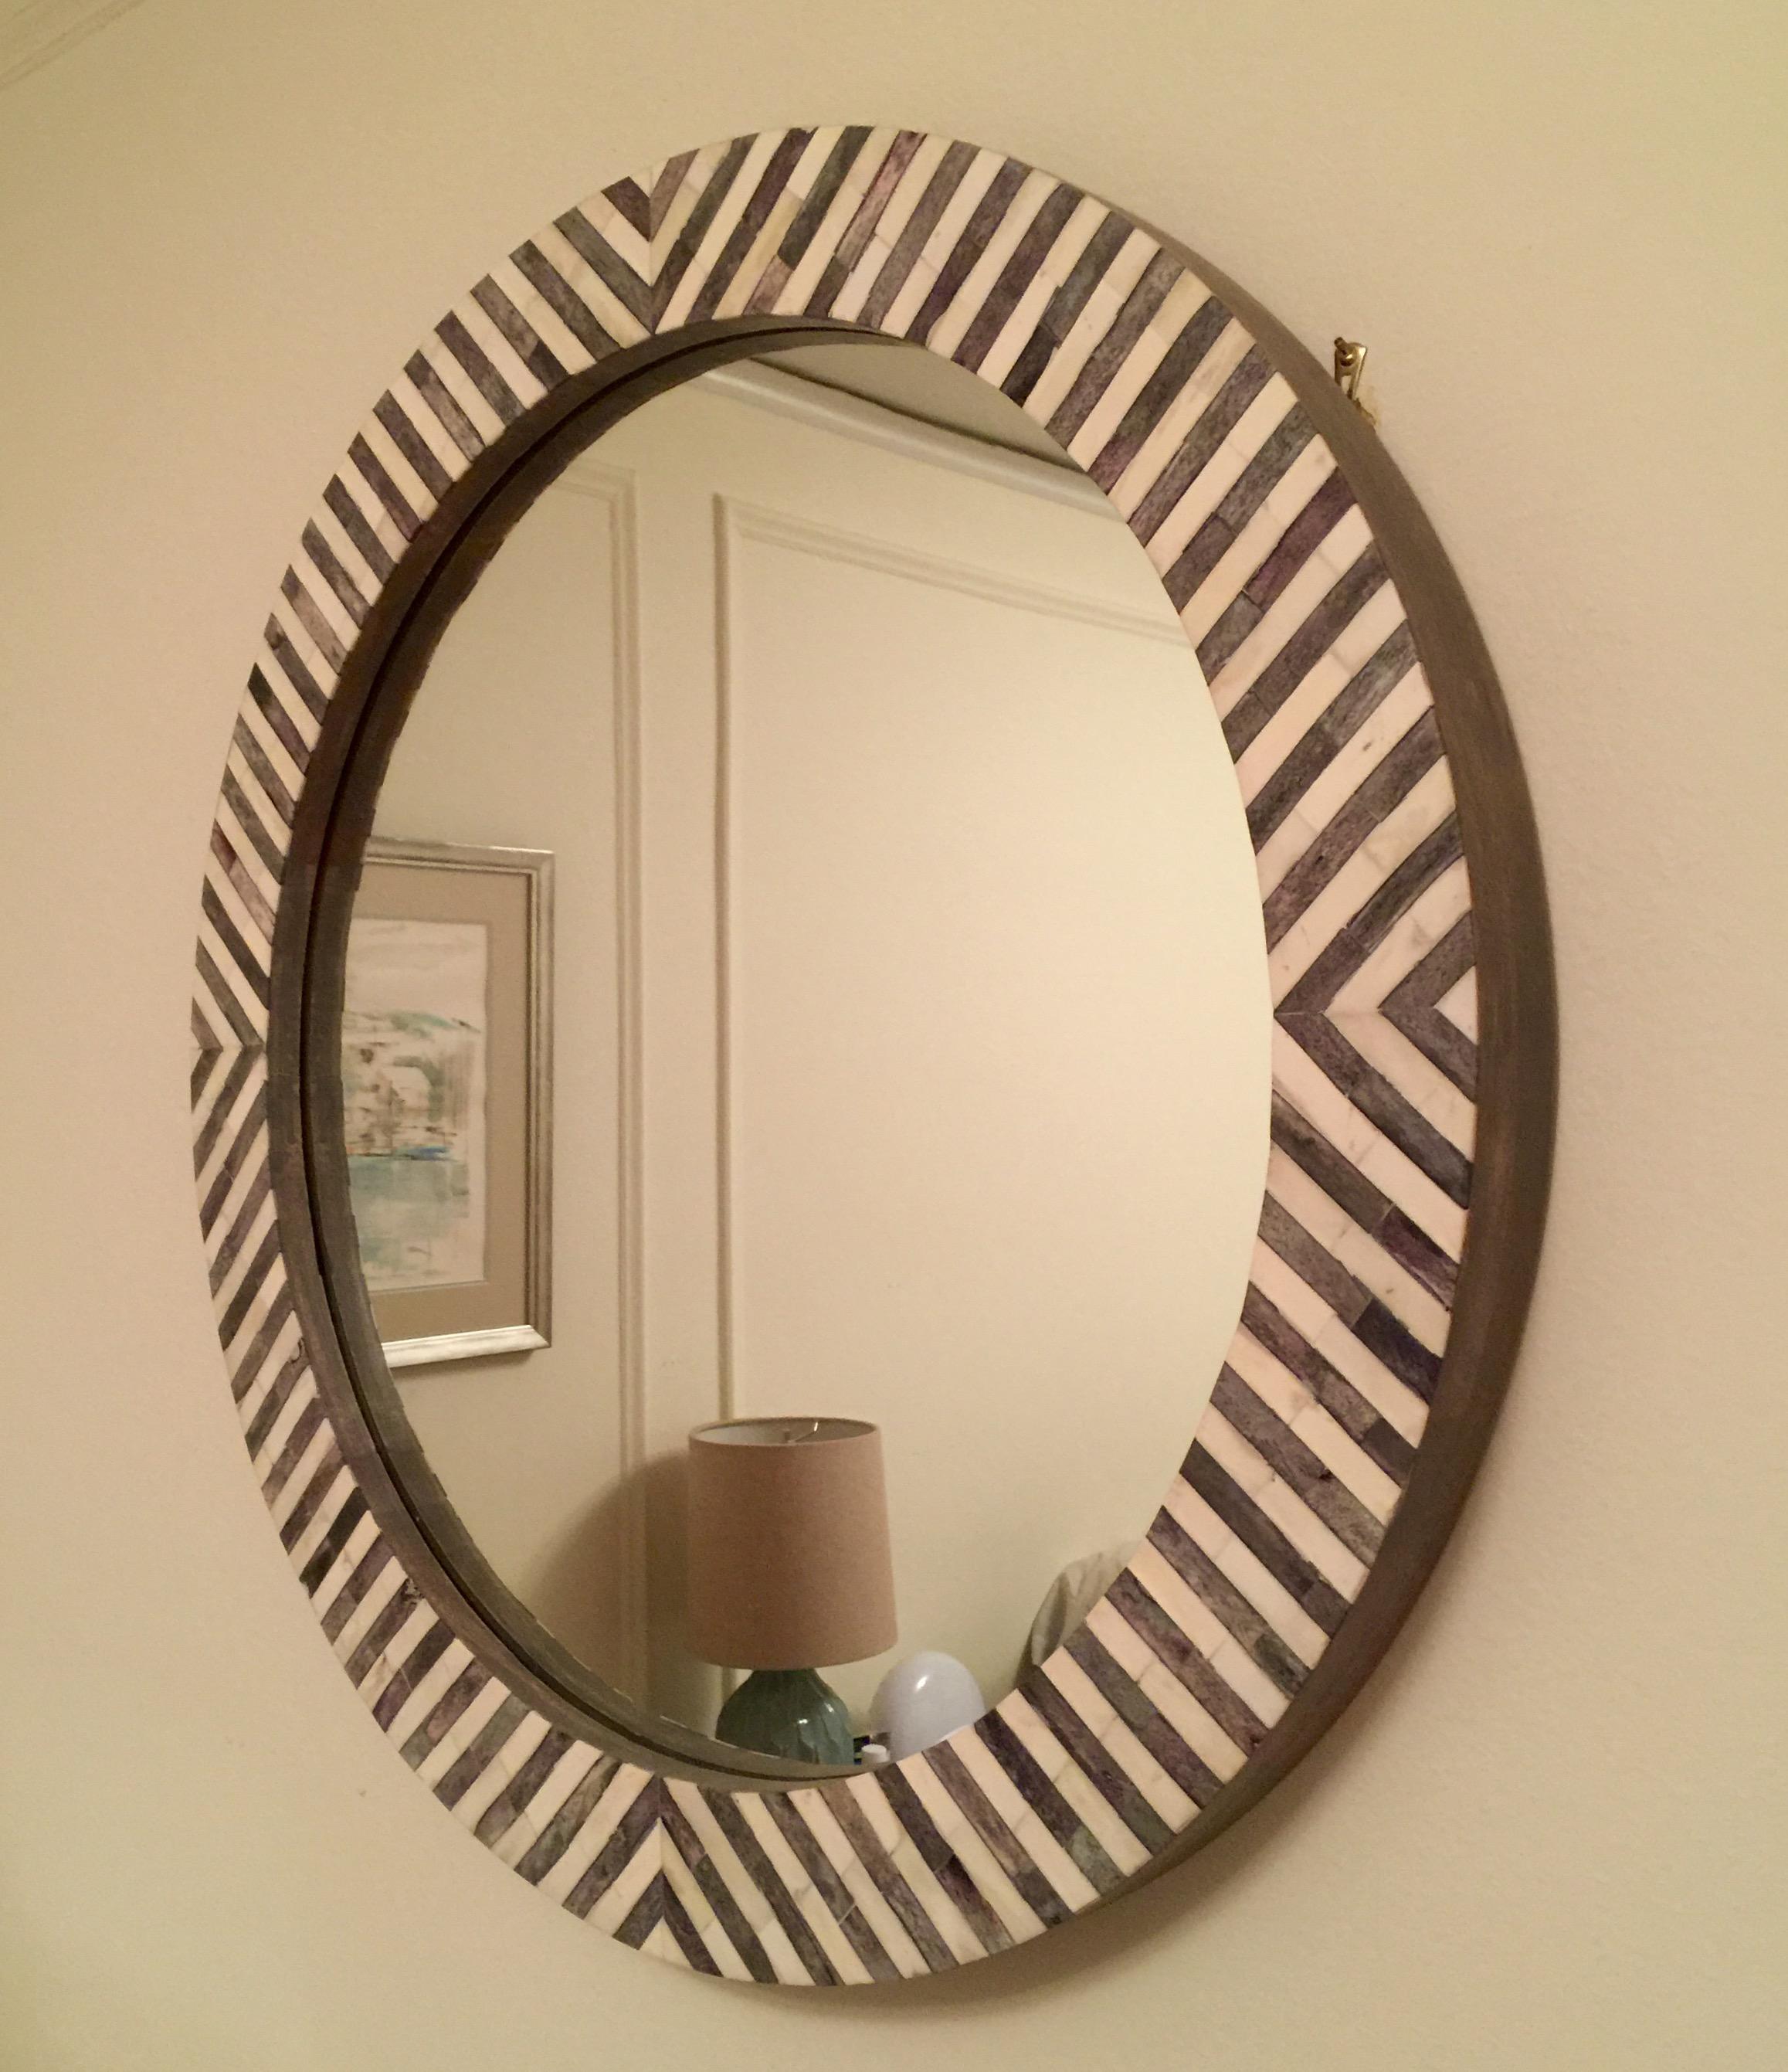 Herringbone mirror